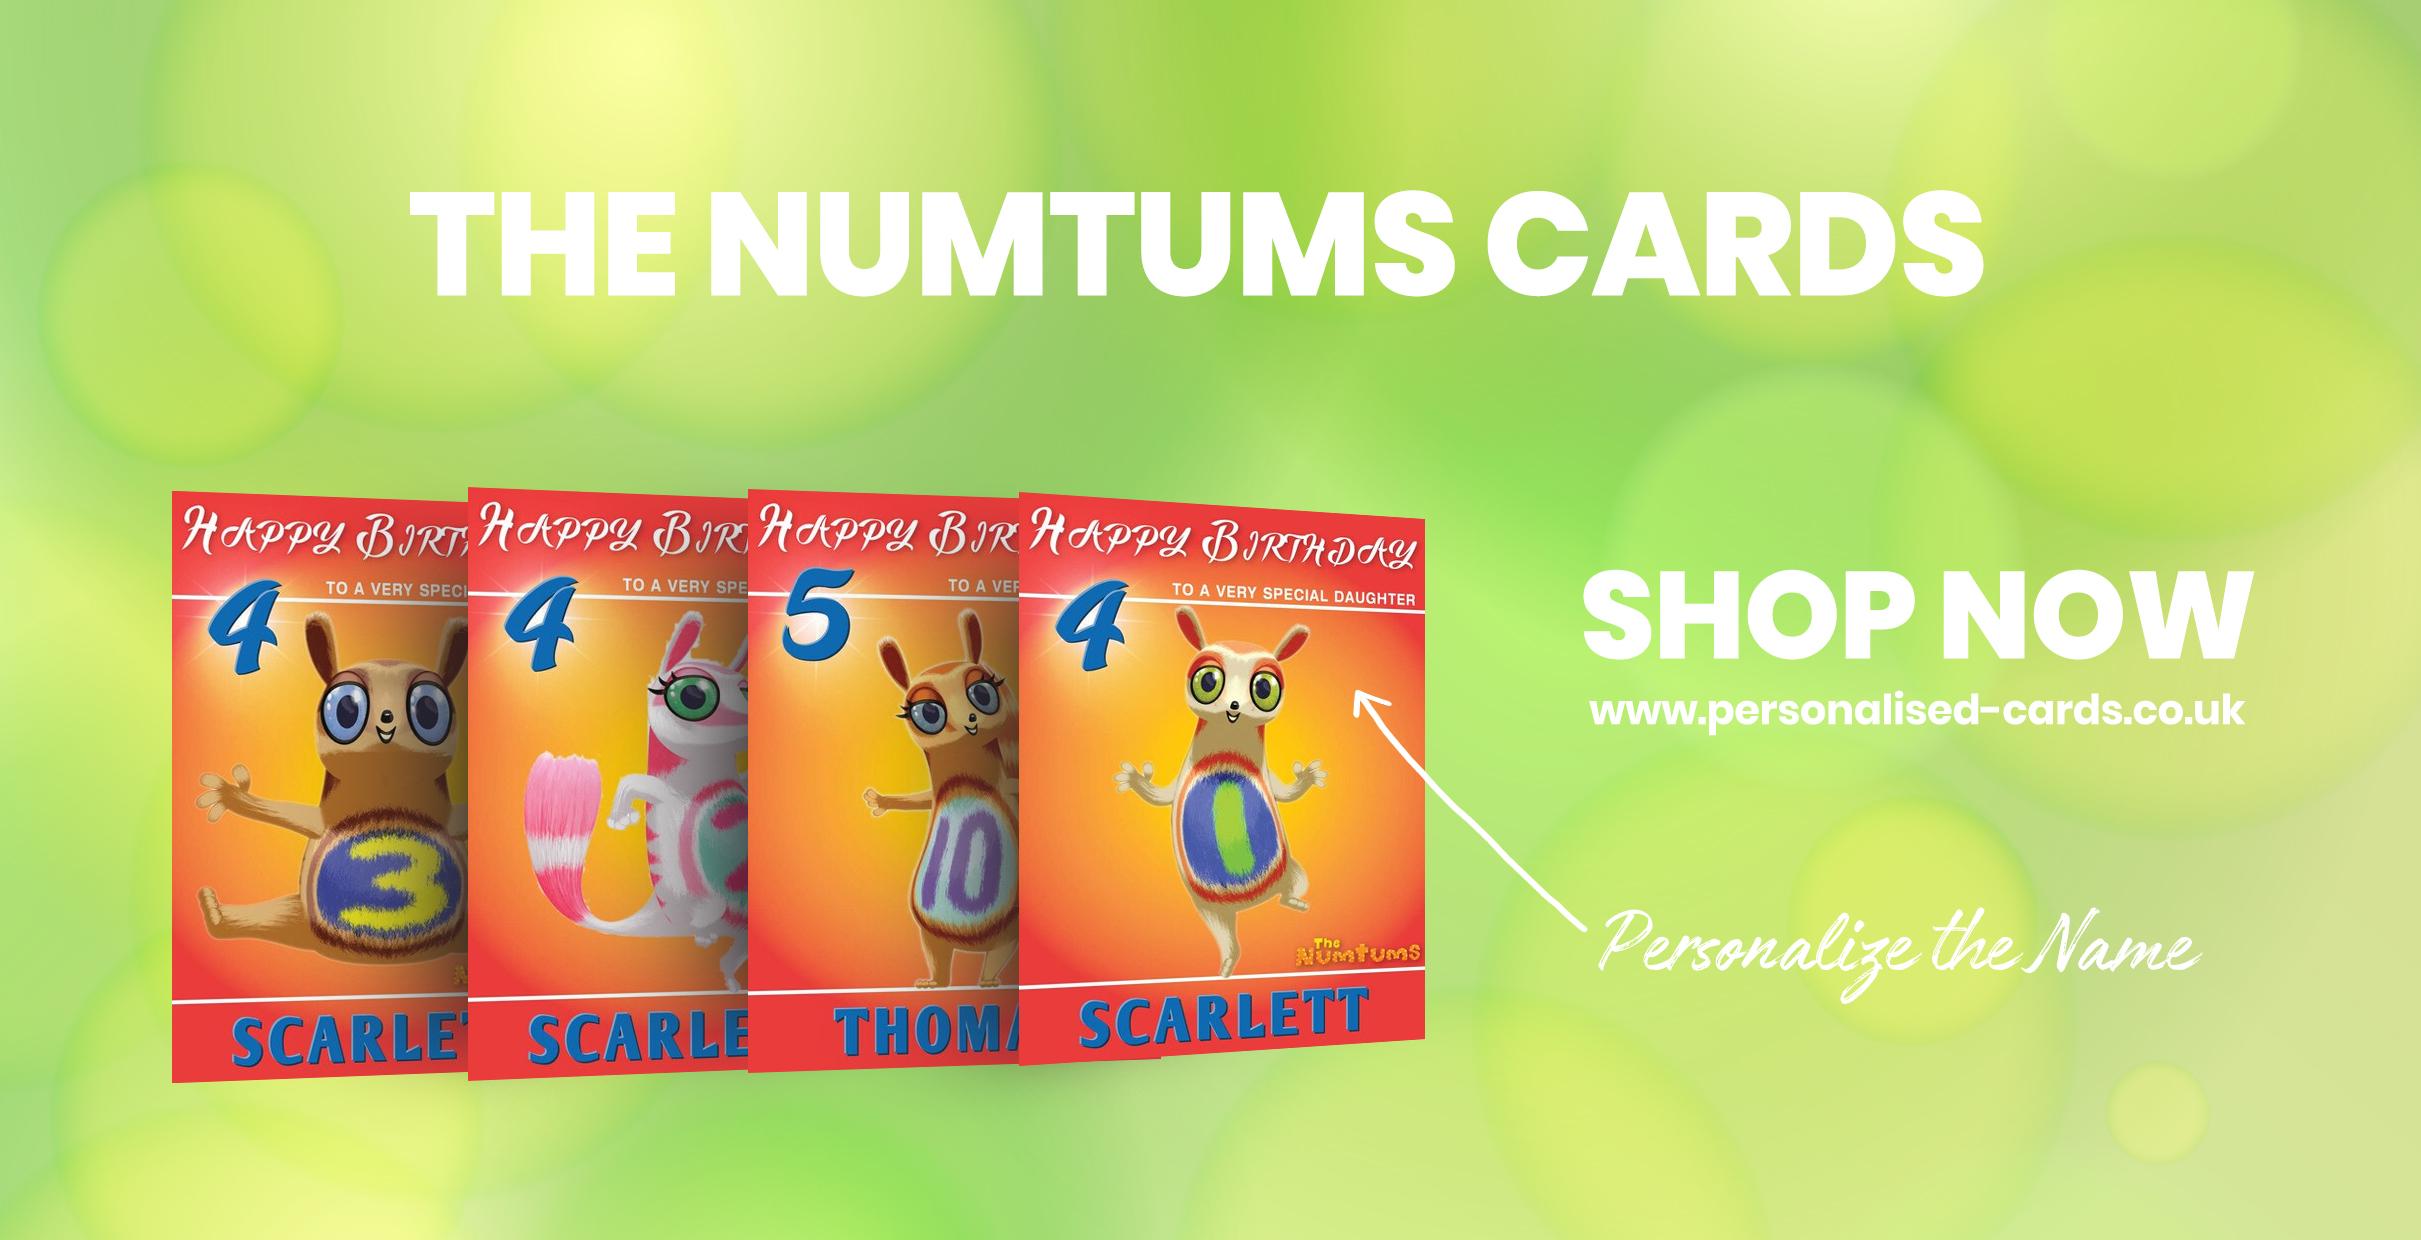 the-numtums-cards.jpg